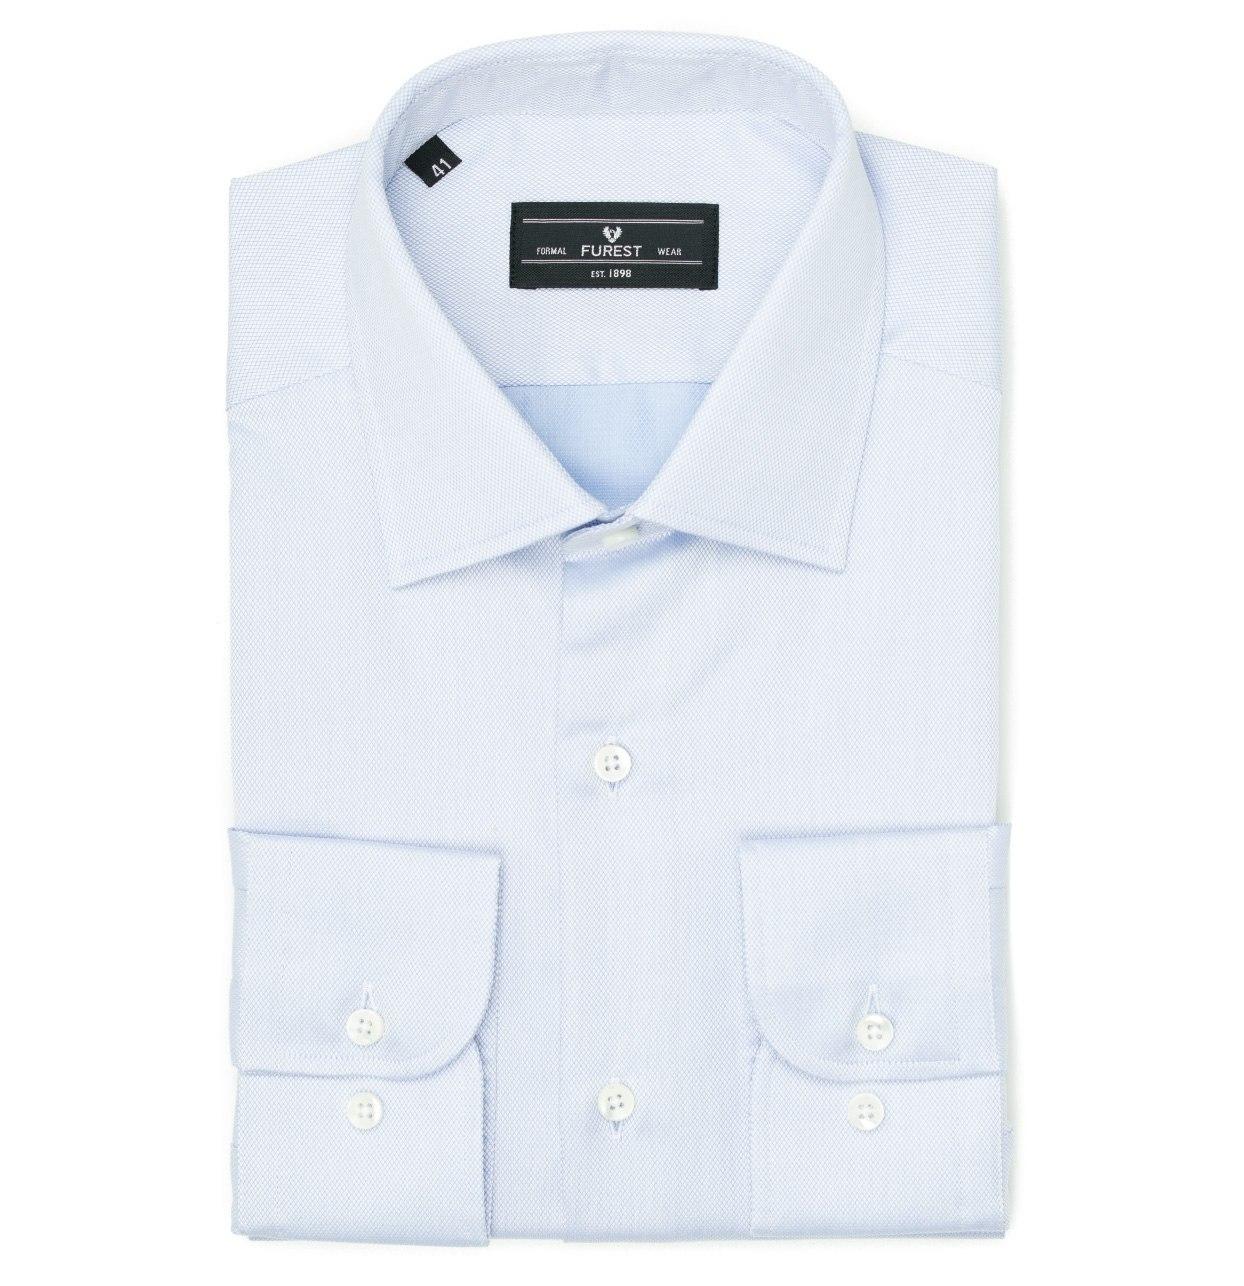 Camisa Formal Wear SLIM FIT cuello italiano modelo ROMA tejido micro dibujo color celeste, 100% Algodón.